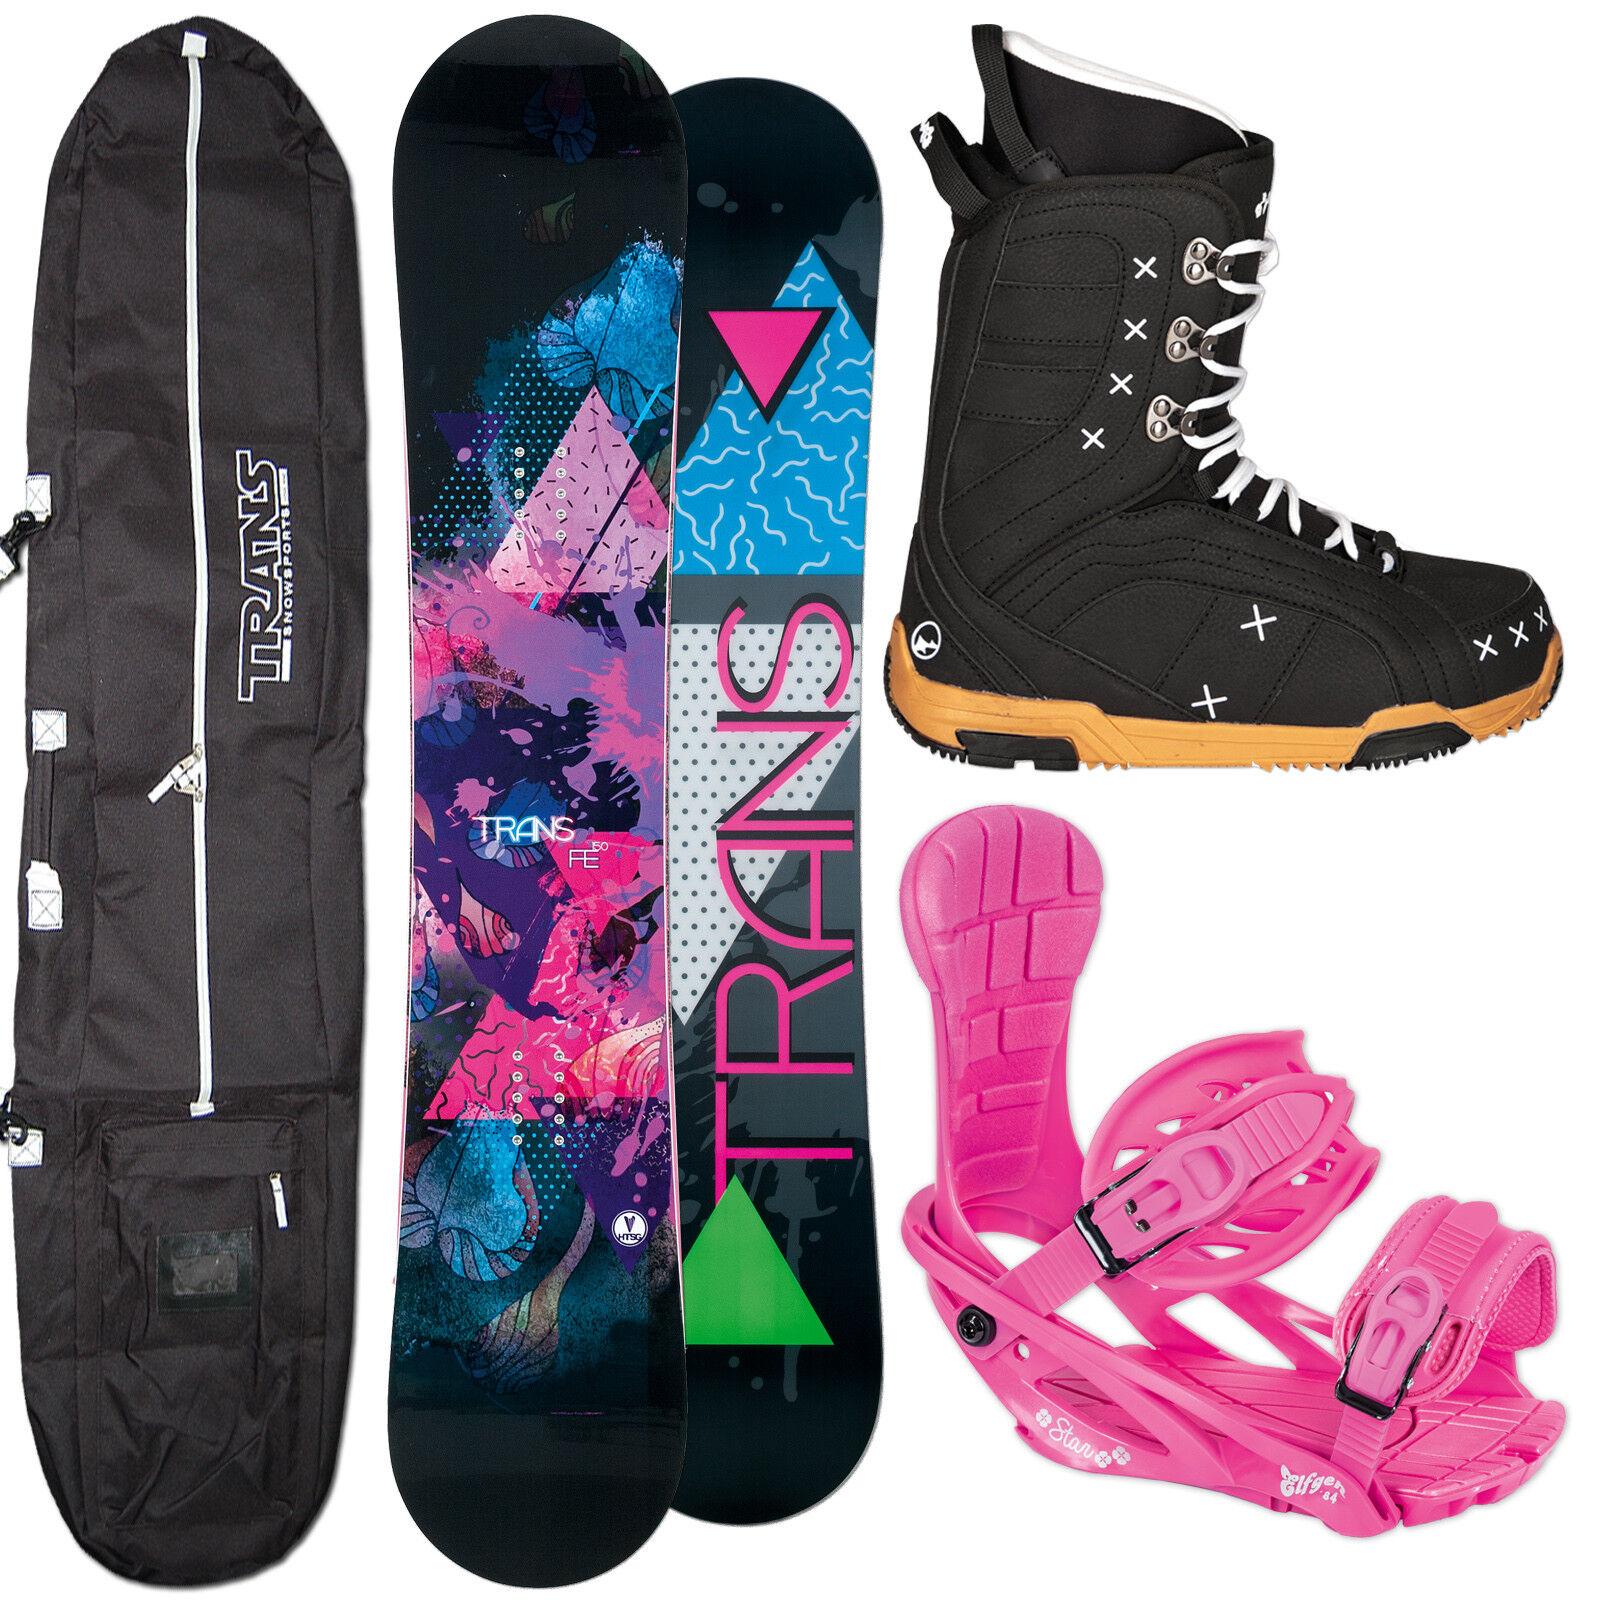 Snowboard Mujer Fe Trans Roquero 143cm + Star Fijación Talla M + botas + Bolsa